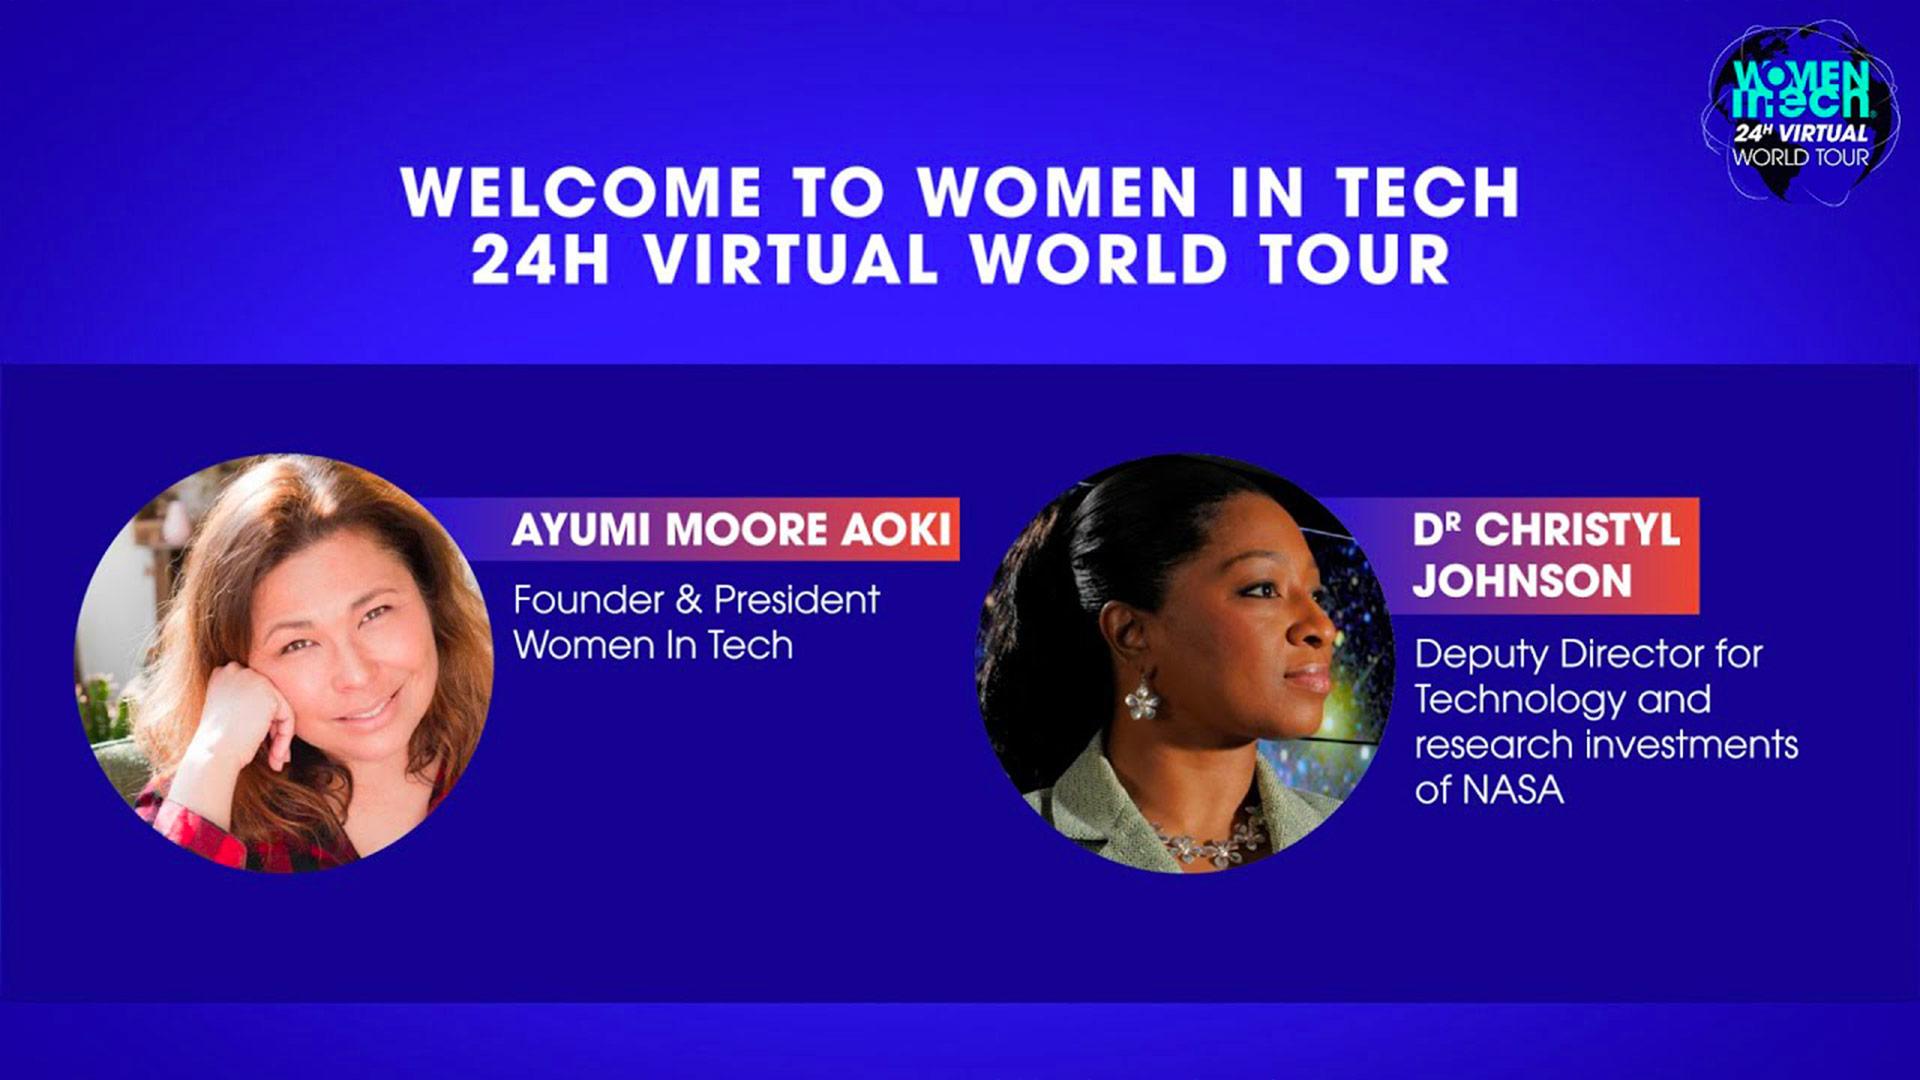 Welcome to Women in Tech® 24h Virtual World Tour